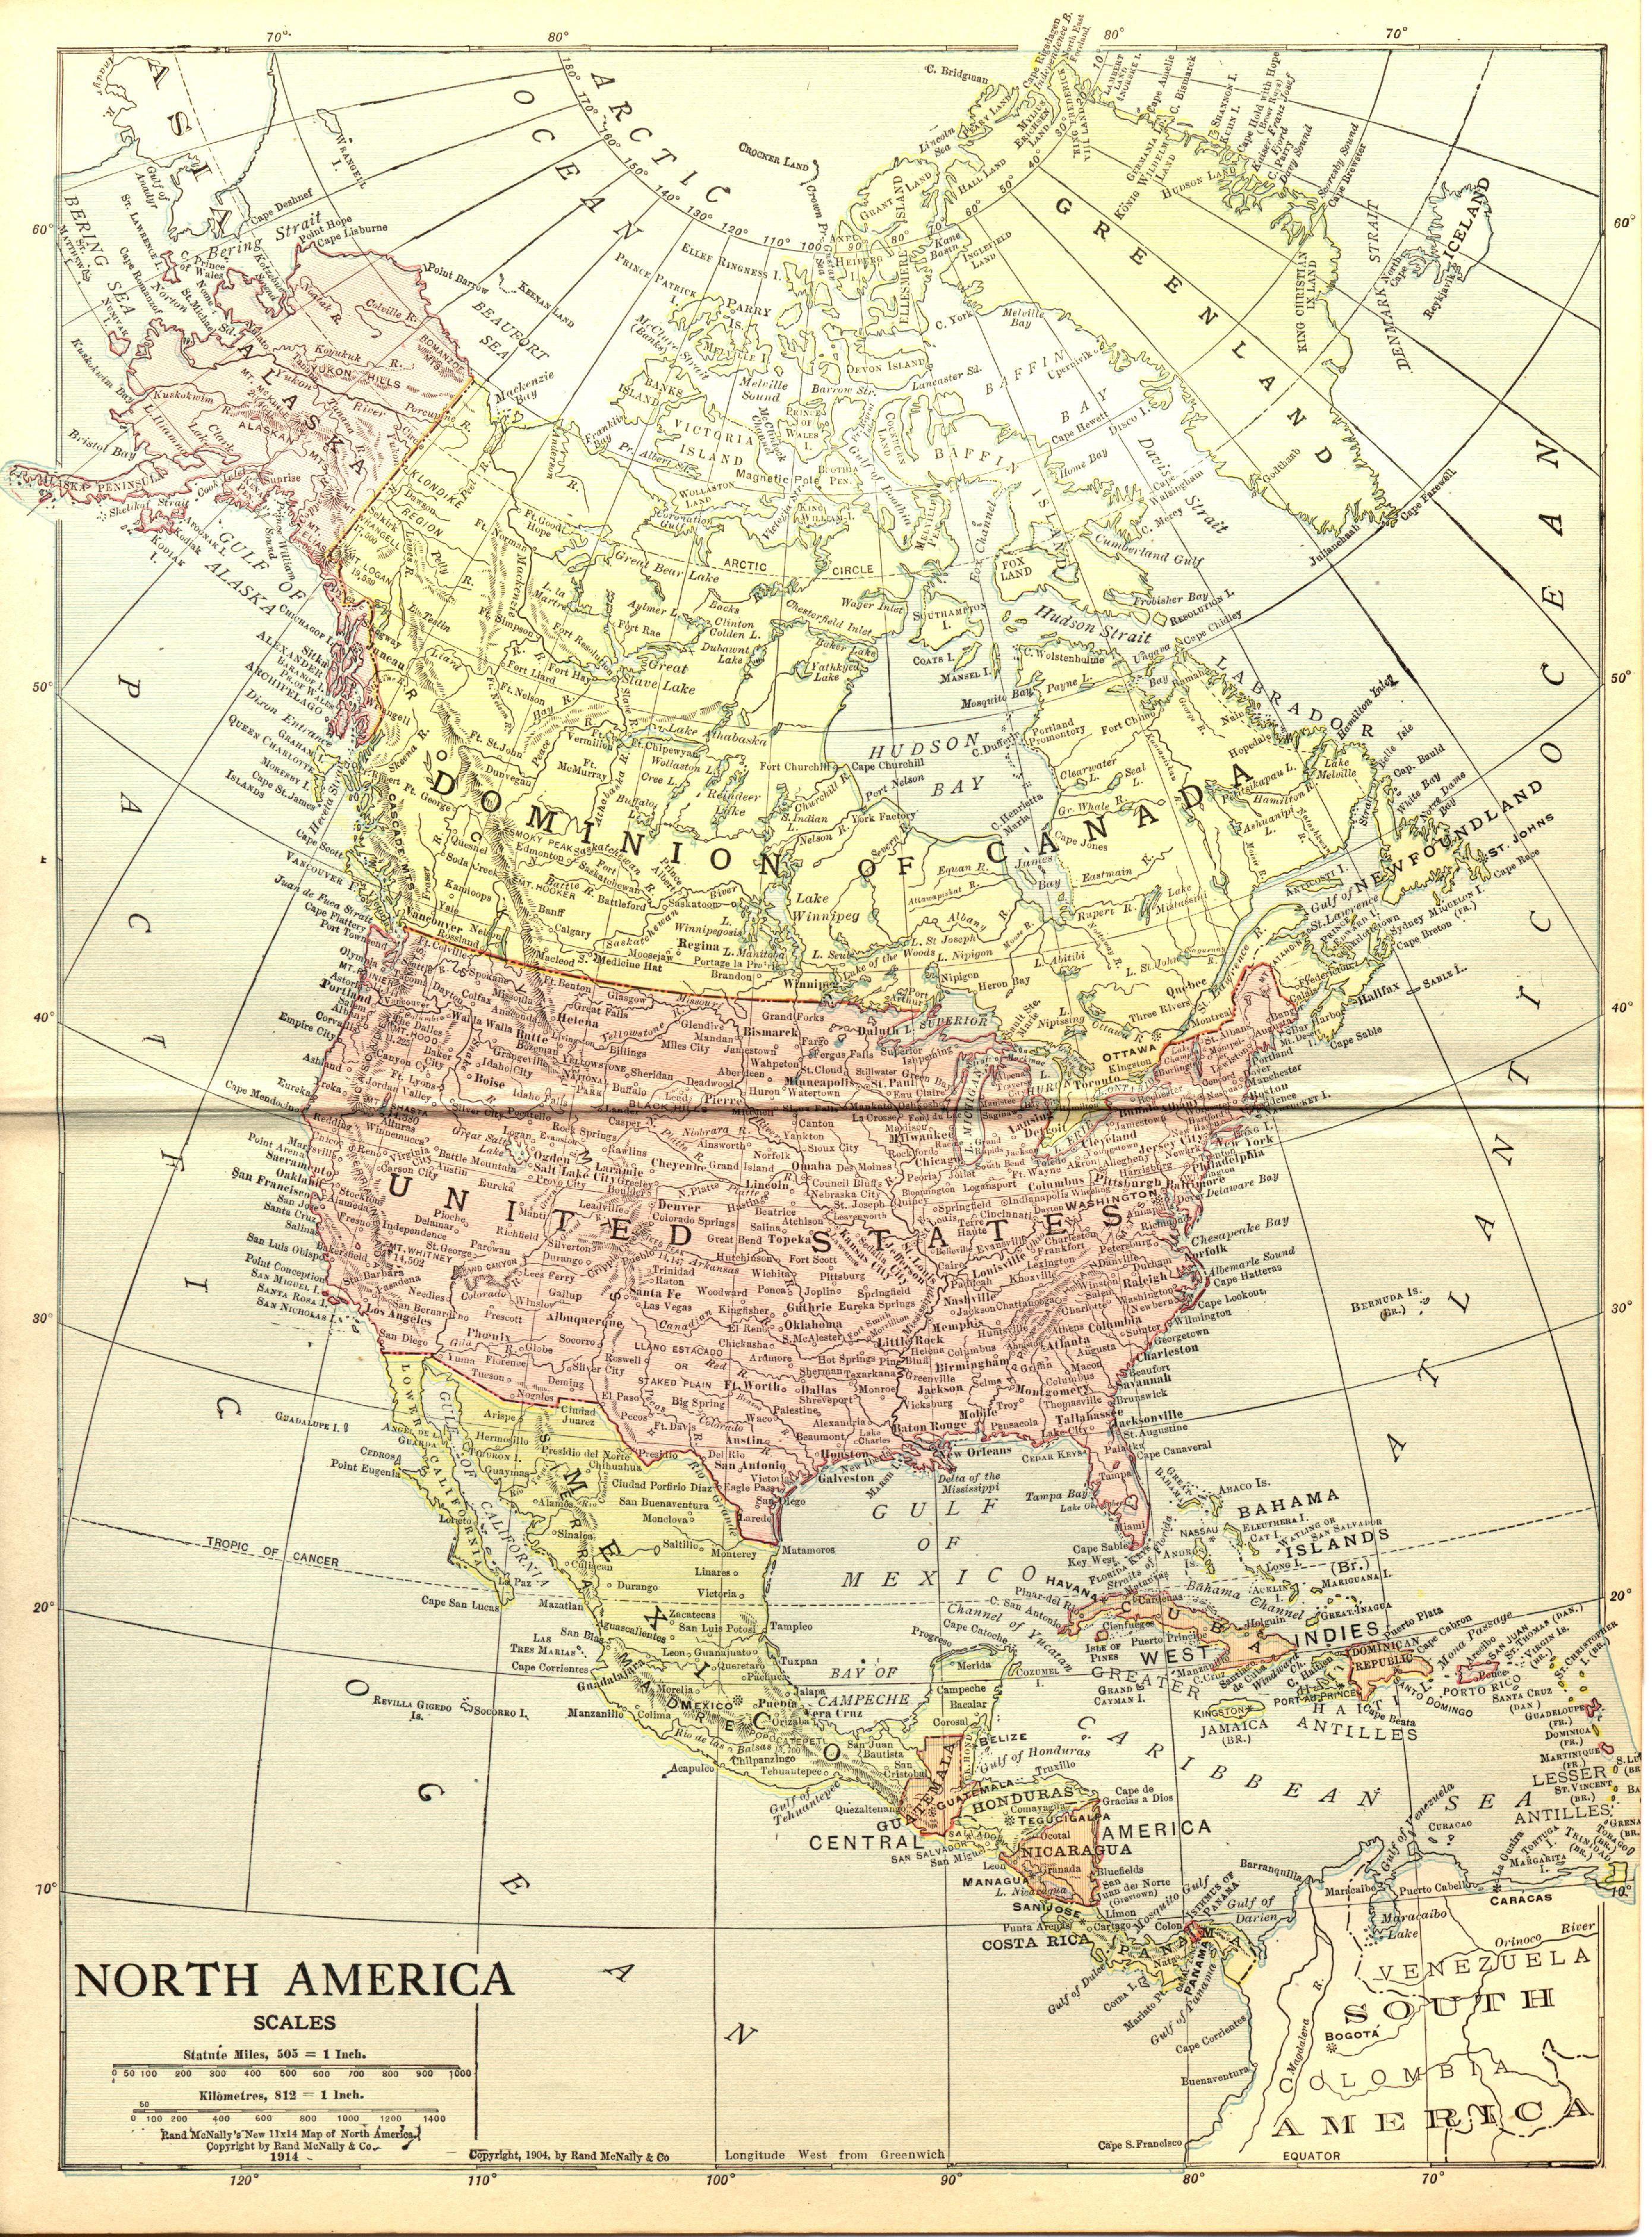 Historic Map Of North America 1914 Weltkarte Com Karten Und